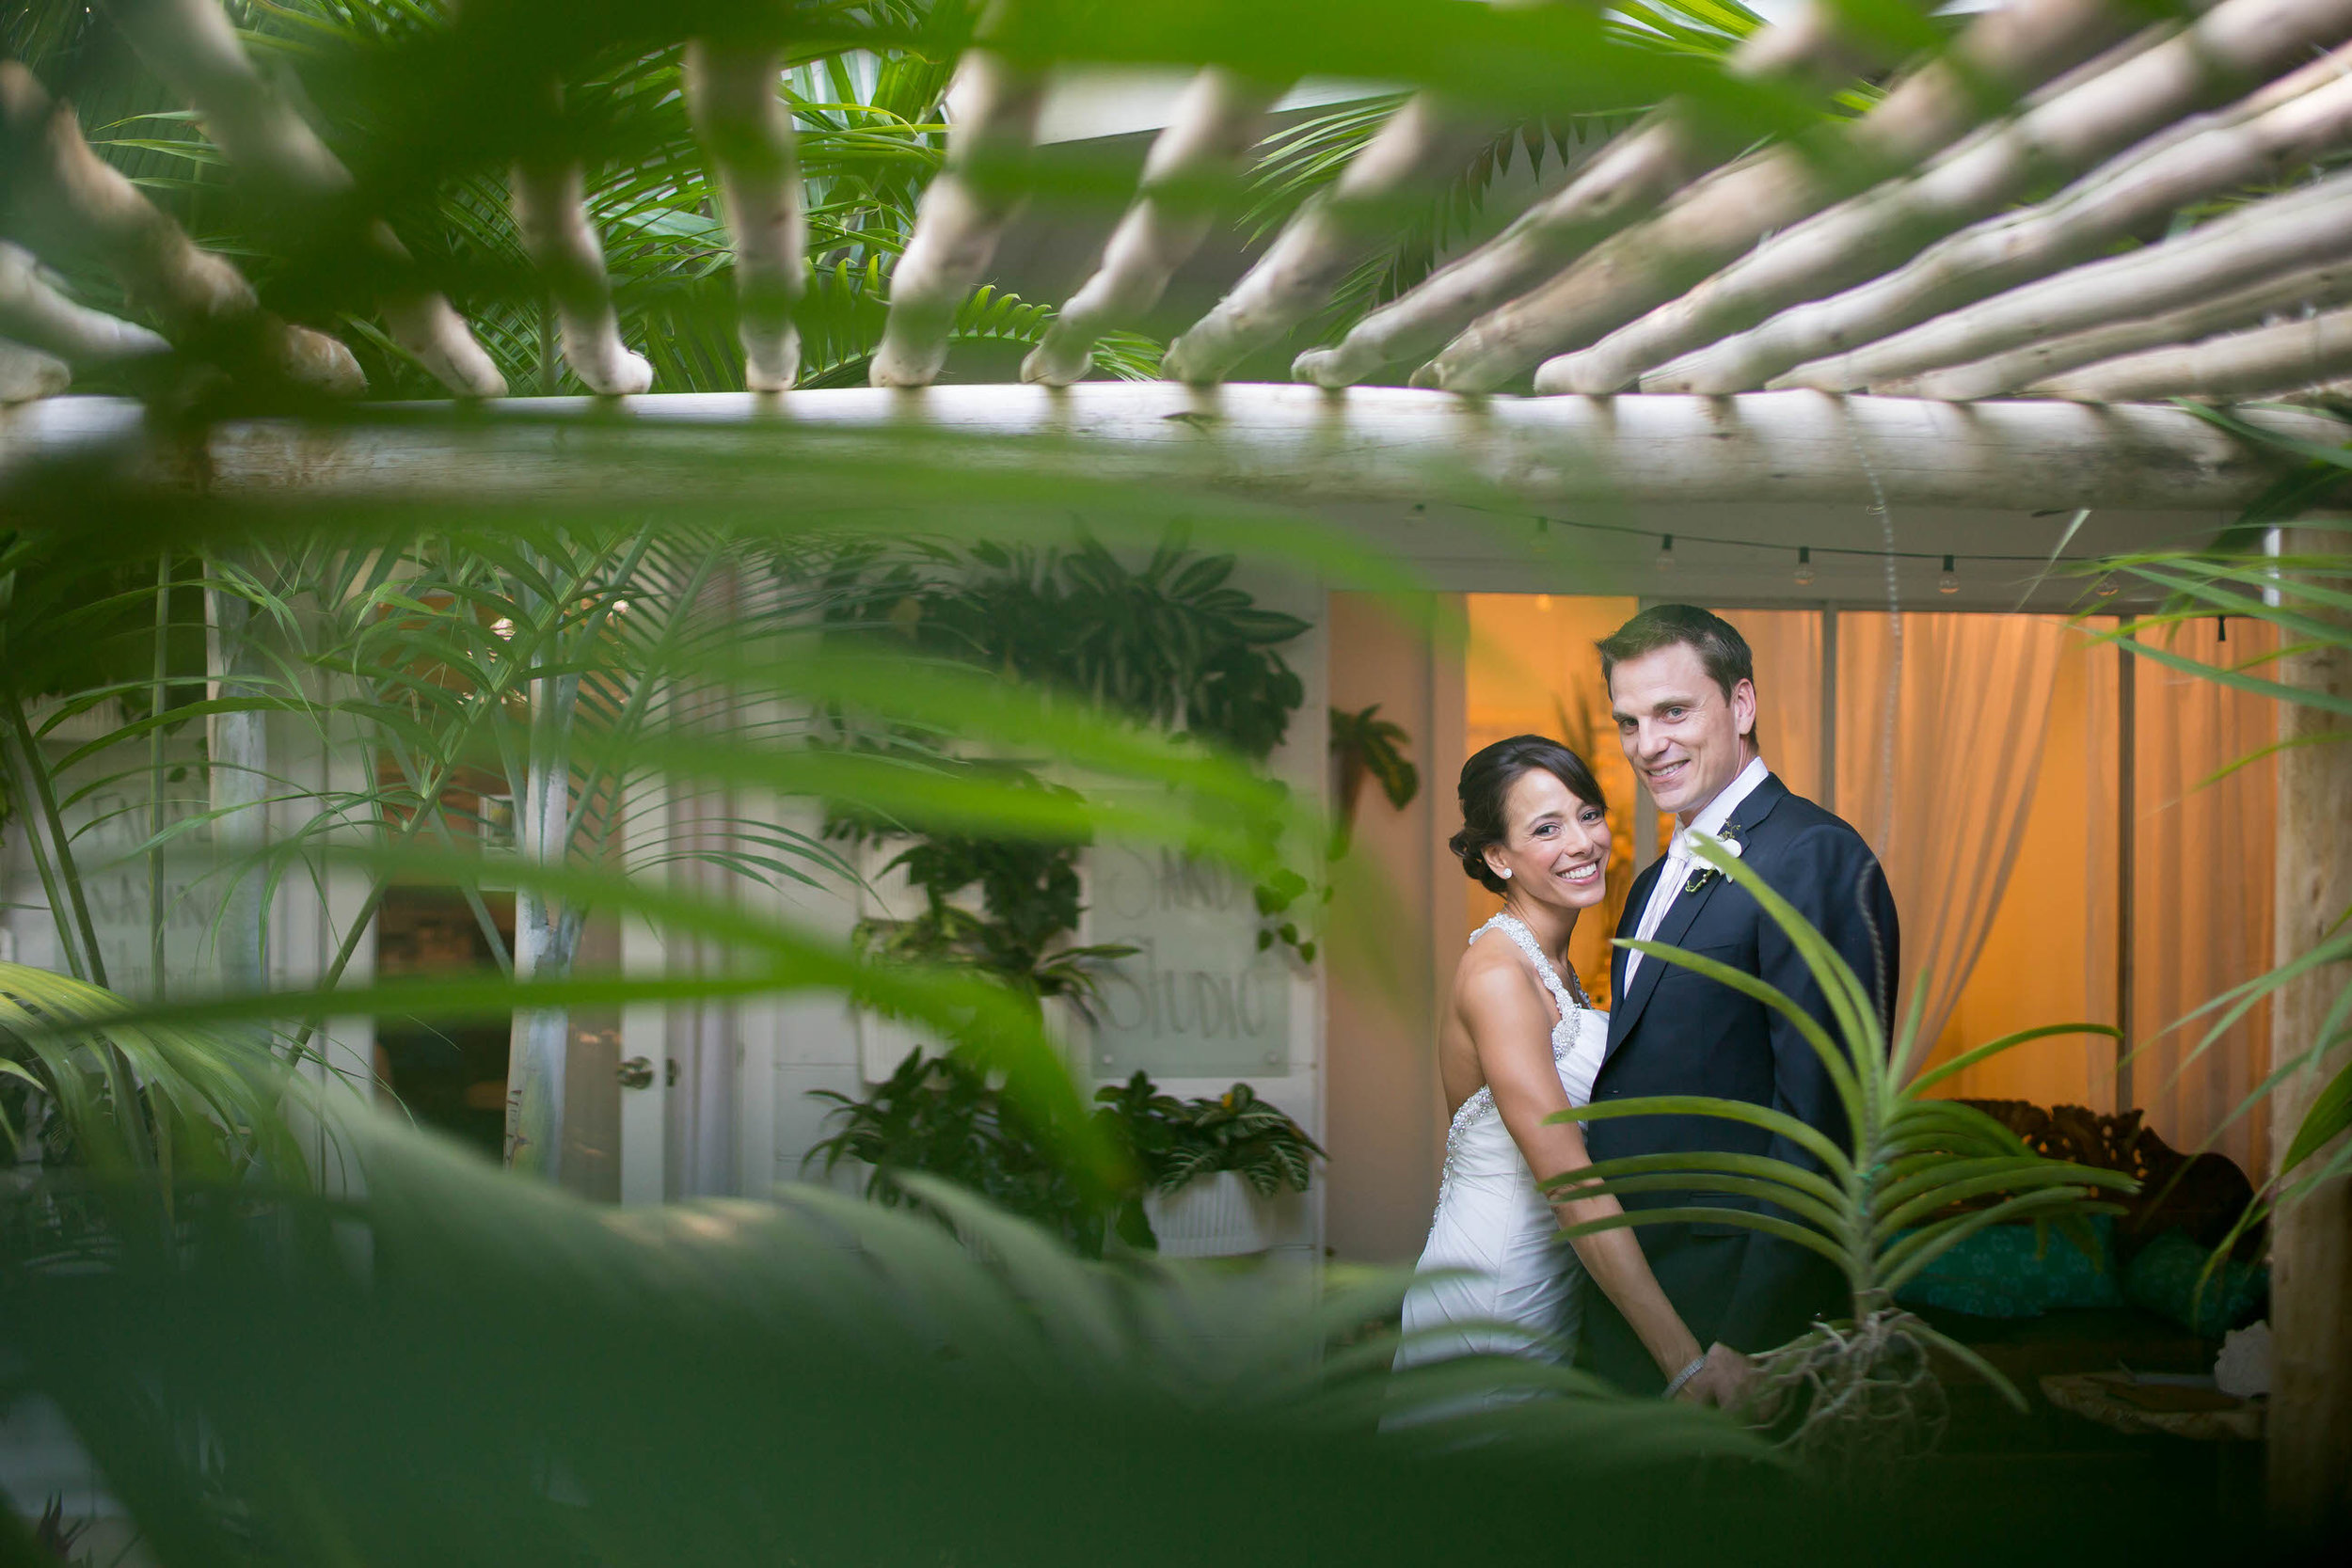 gorgeous_bride_groom_key_west_destination_wedding_photographer_tiny_house_photo.jpg